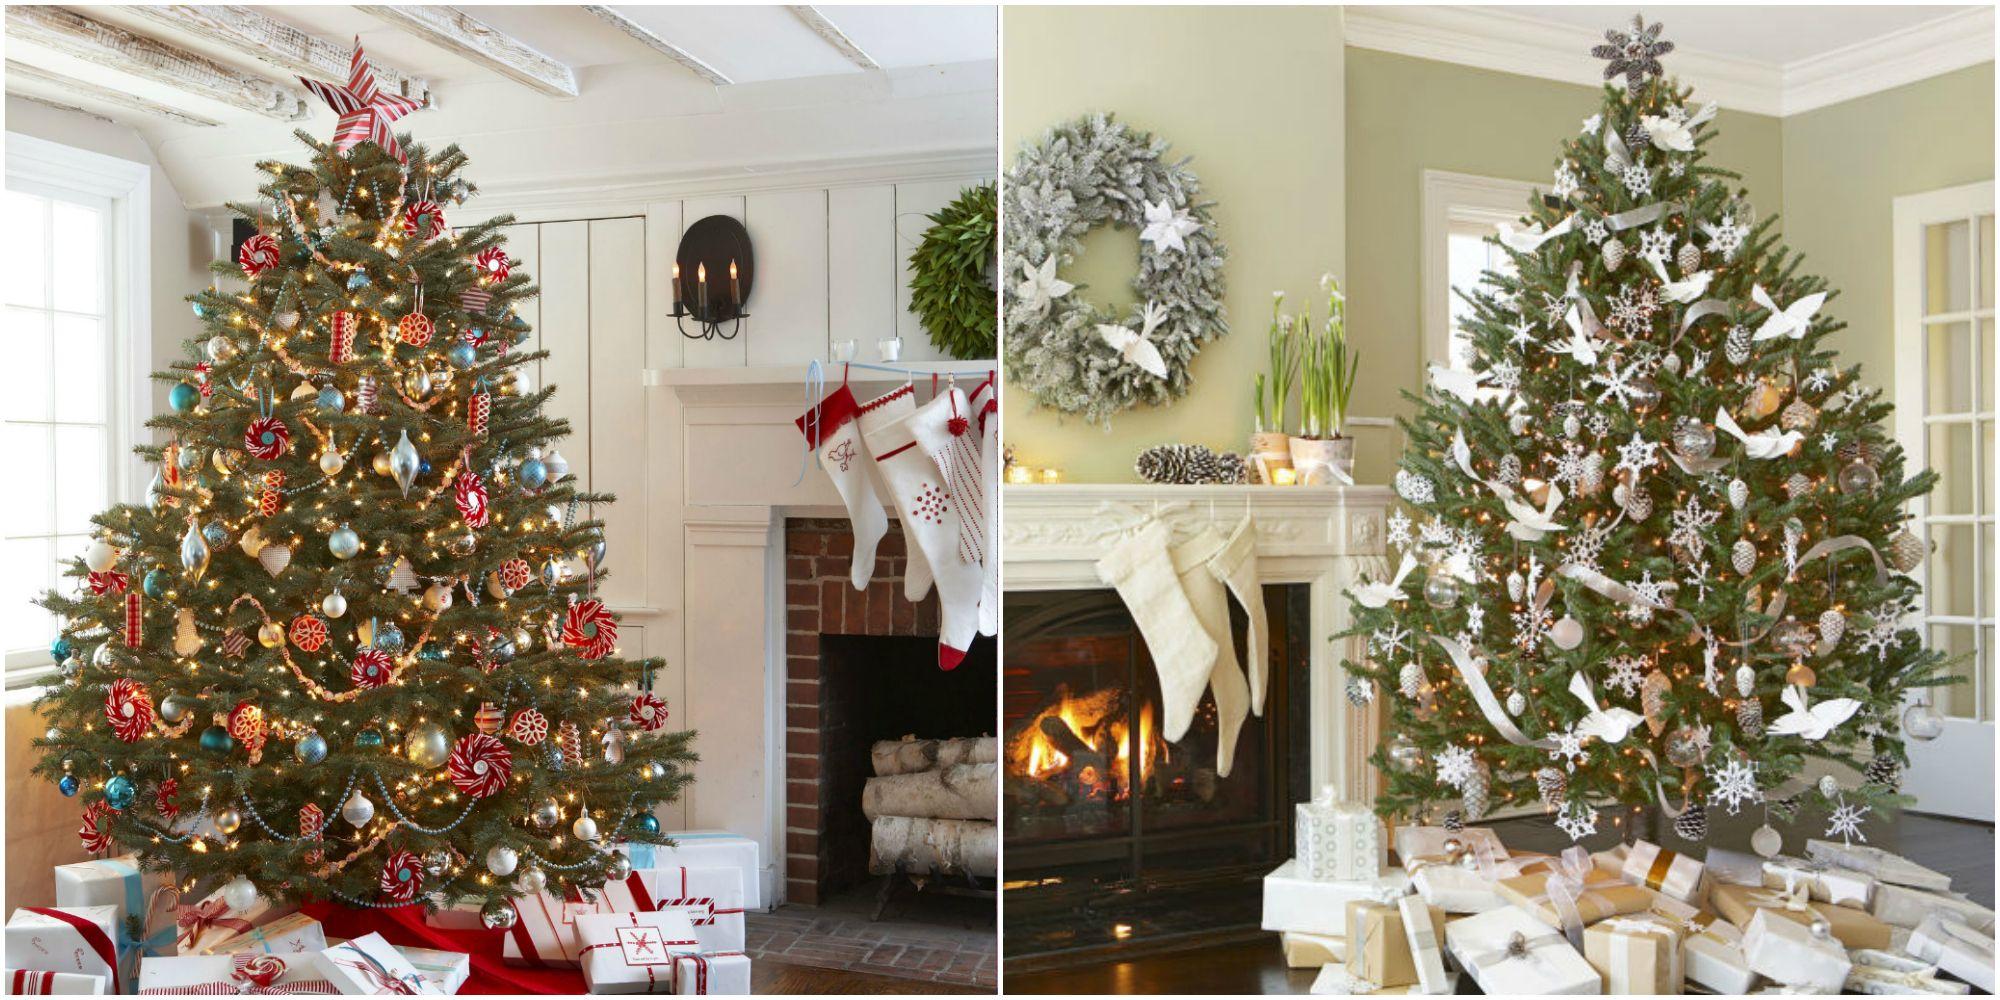 25 Decorated Christmas Tree Ideas of Christmas Tree